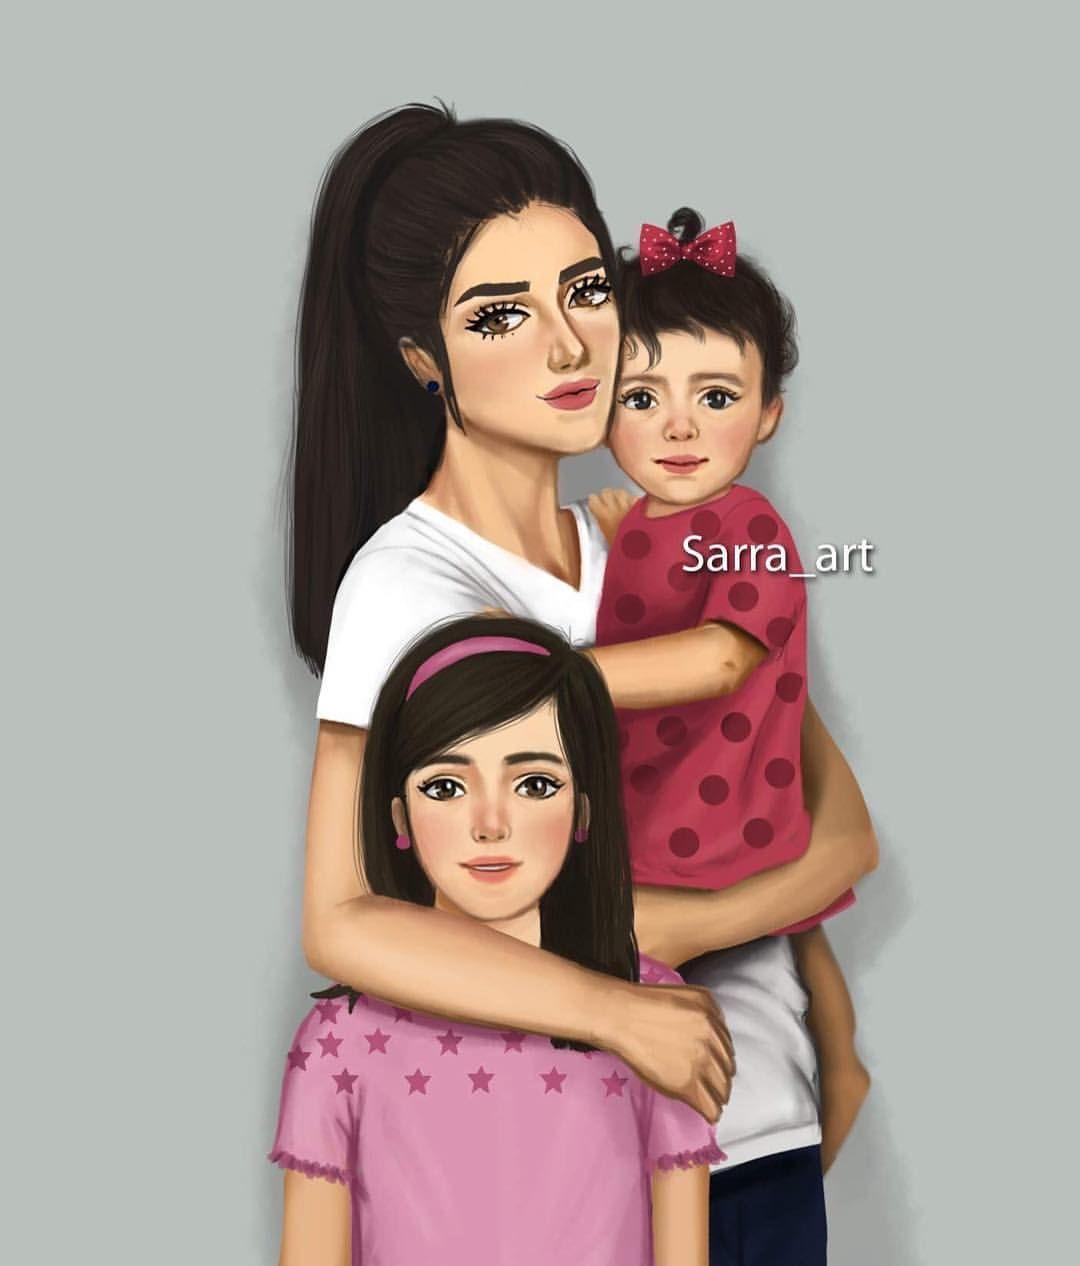 5 213 Likes 378 Comments Sara Ahmed Sarra Art On Instagram بناتي حلو أيامي وسعادتي اجتمعت بكم مييييين هن Sarra Art Mother Daughter Art Mother Art